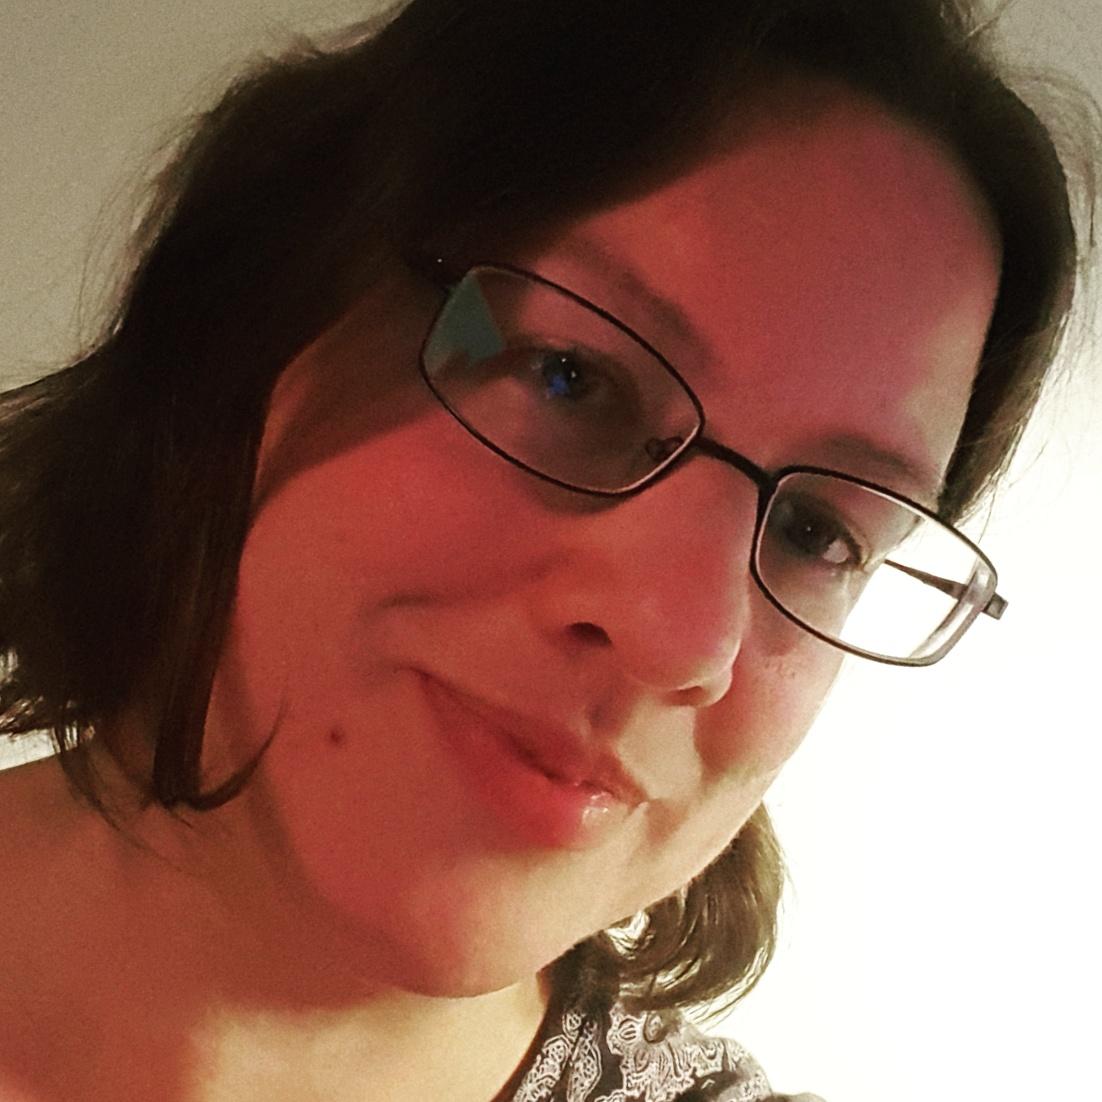 amatör lesbisk porr sida